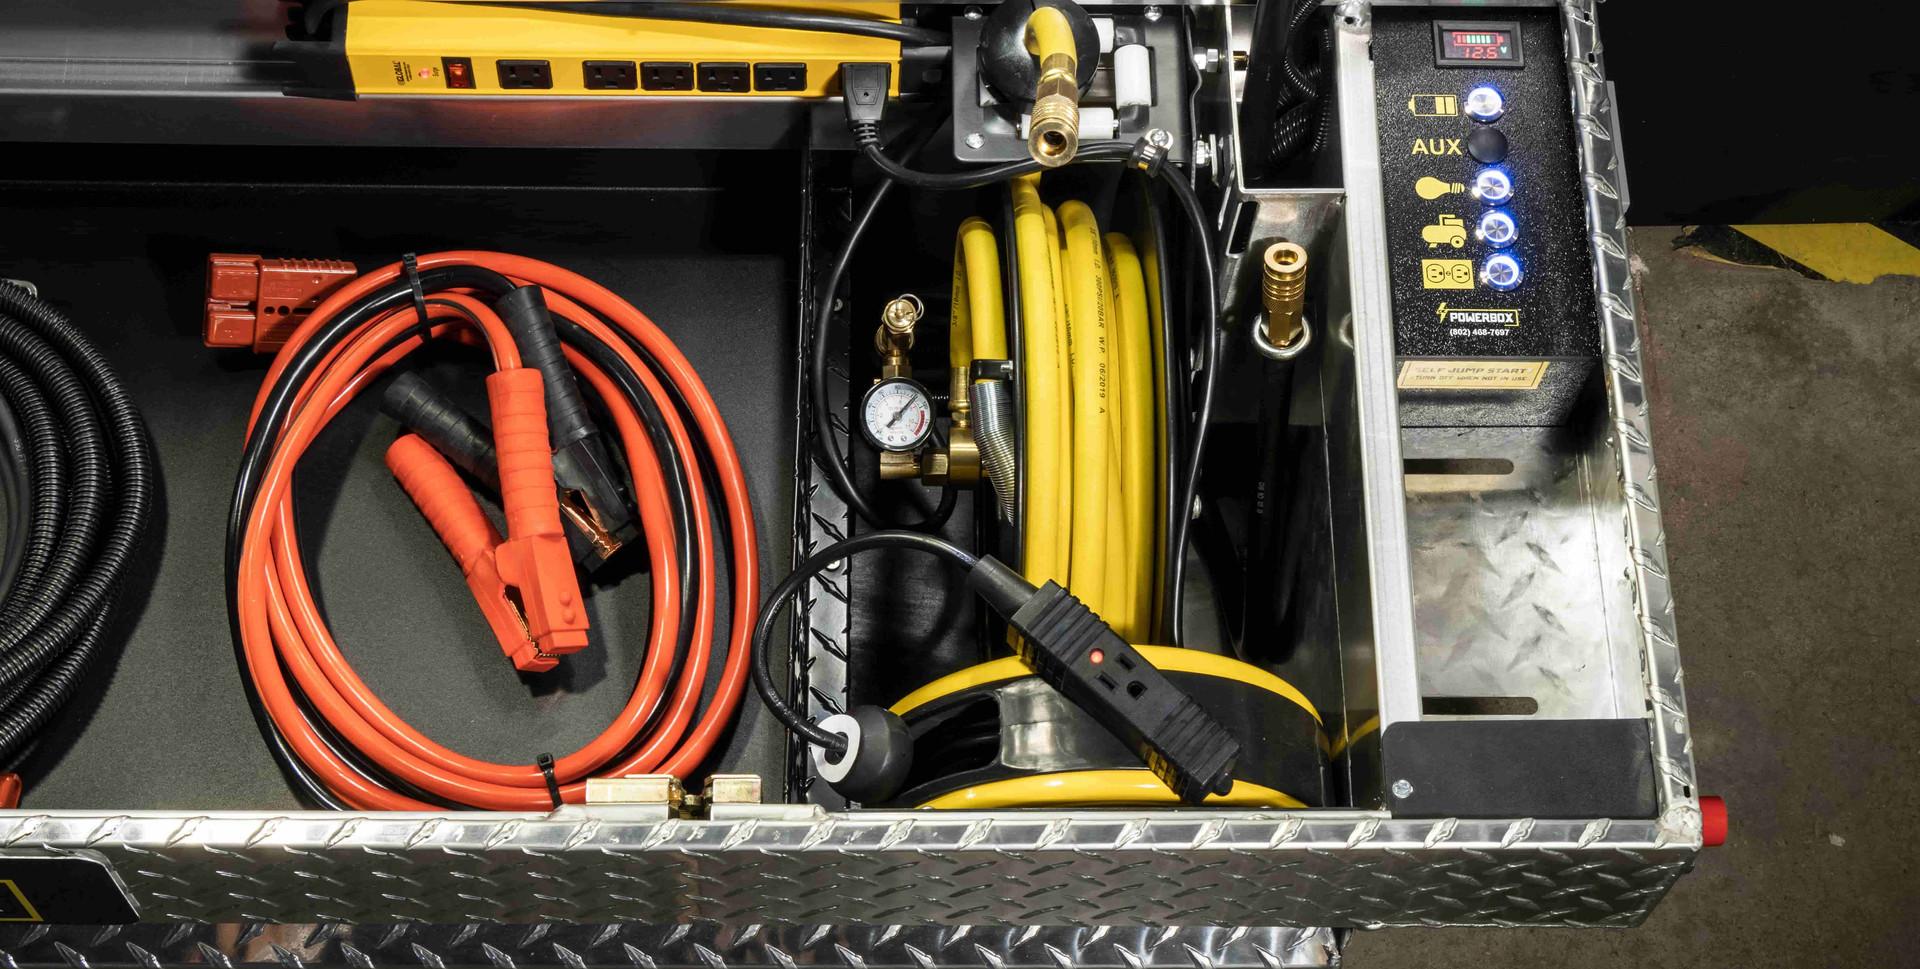 Powerbox Portable Power Toolbox Generator